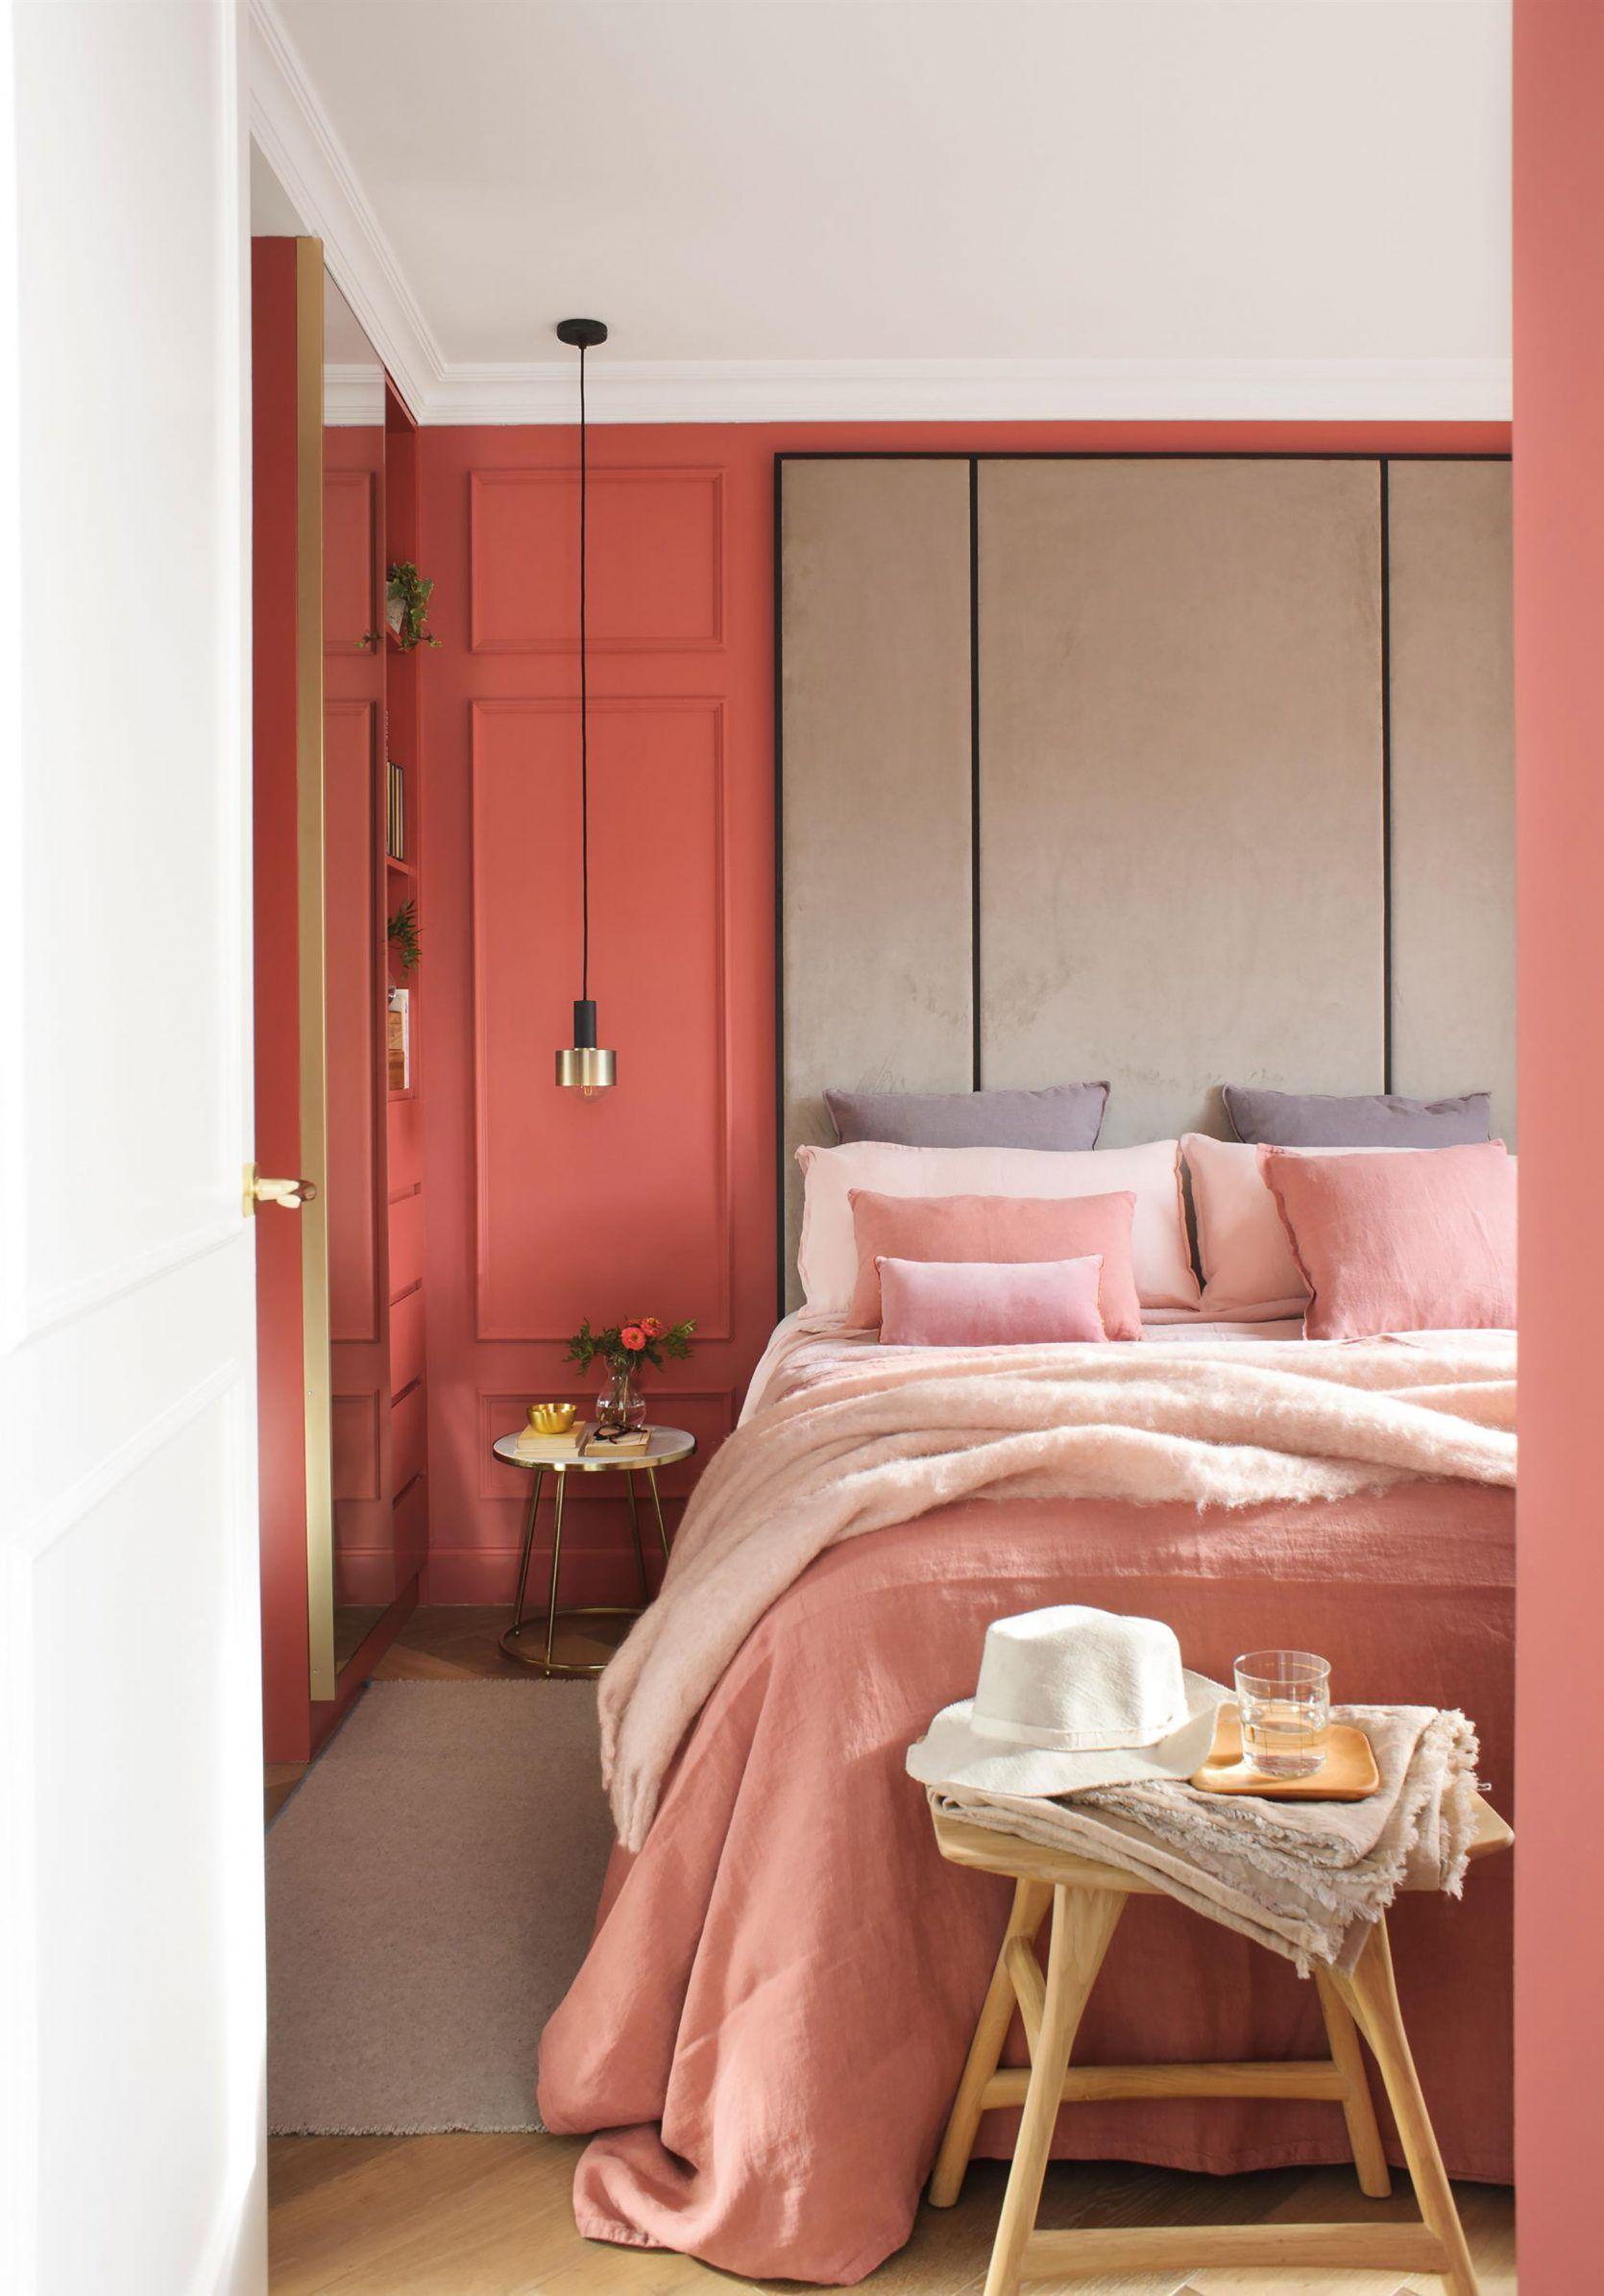 2019 Paint Color Trends Home decor bedroom, Bedroom